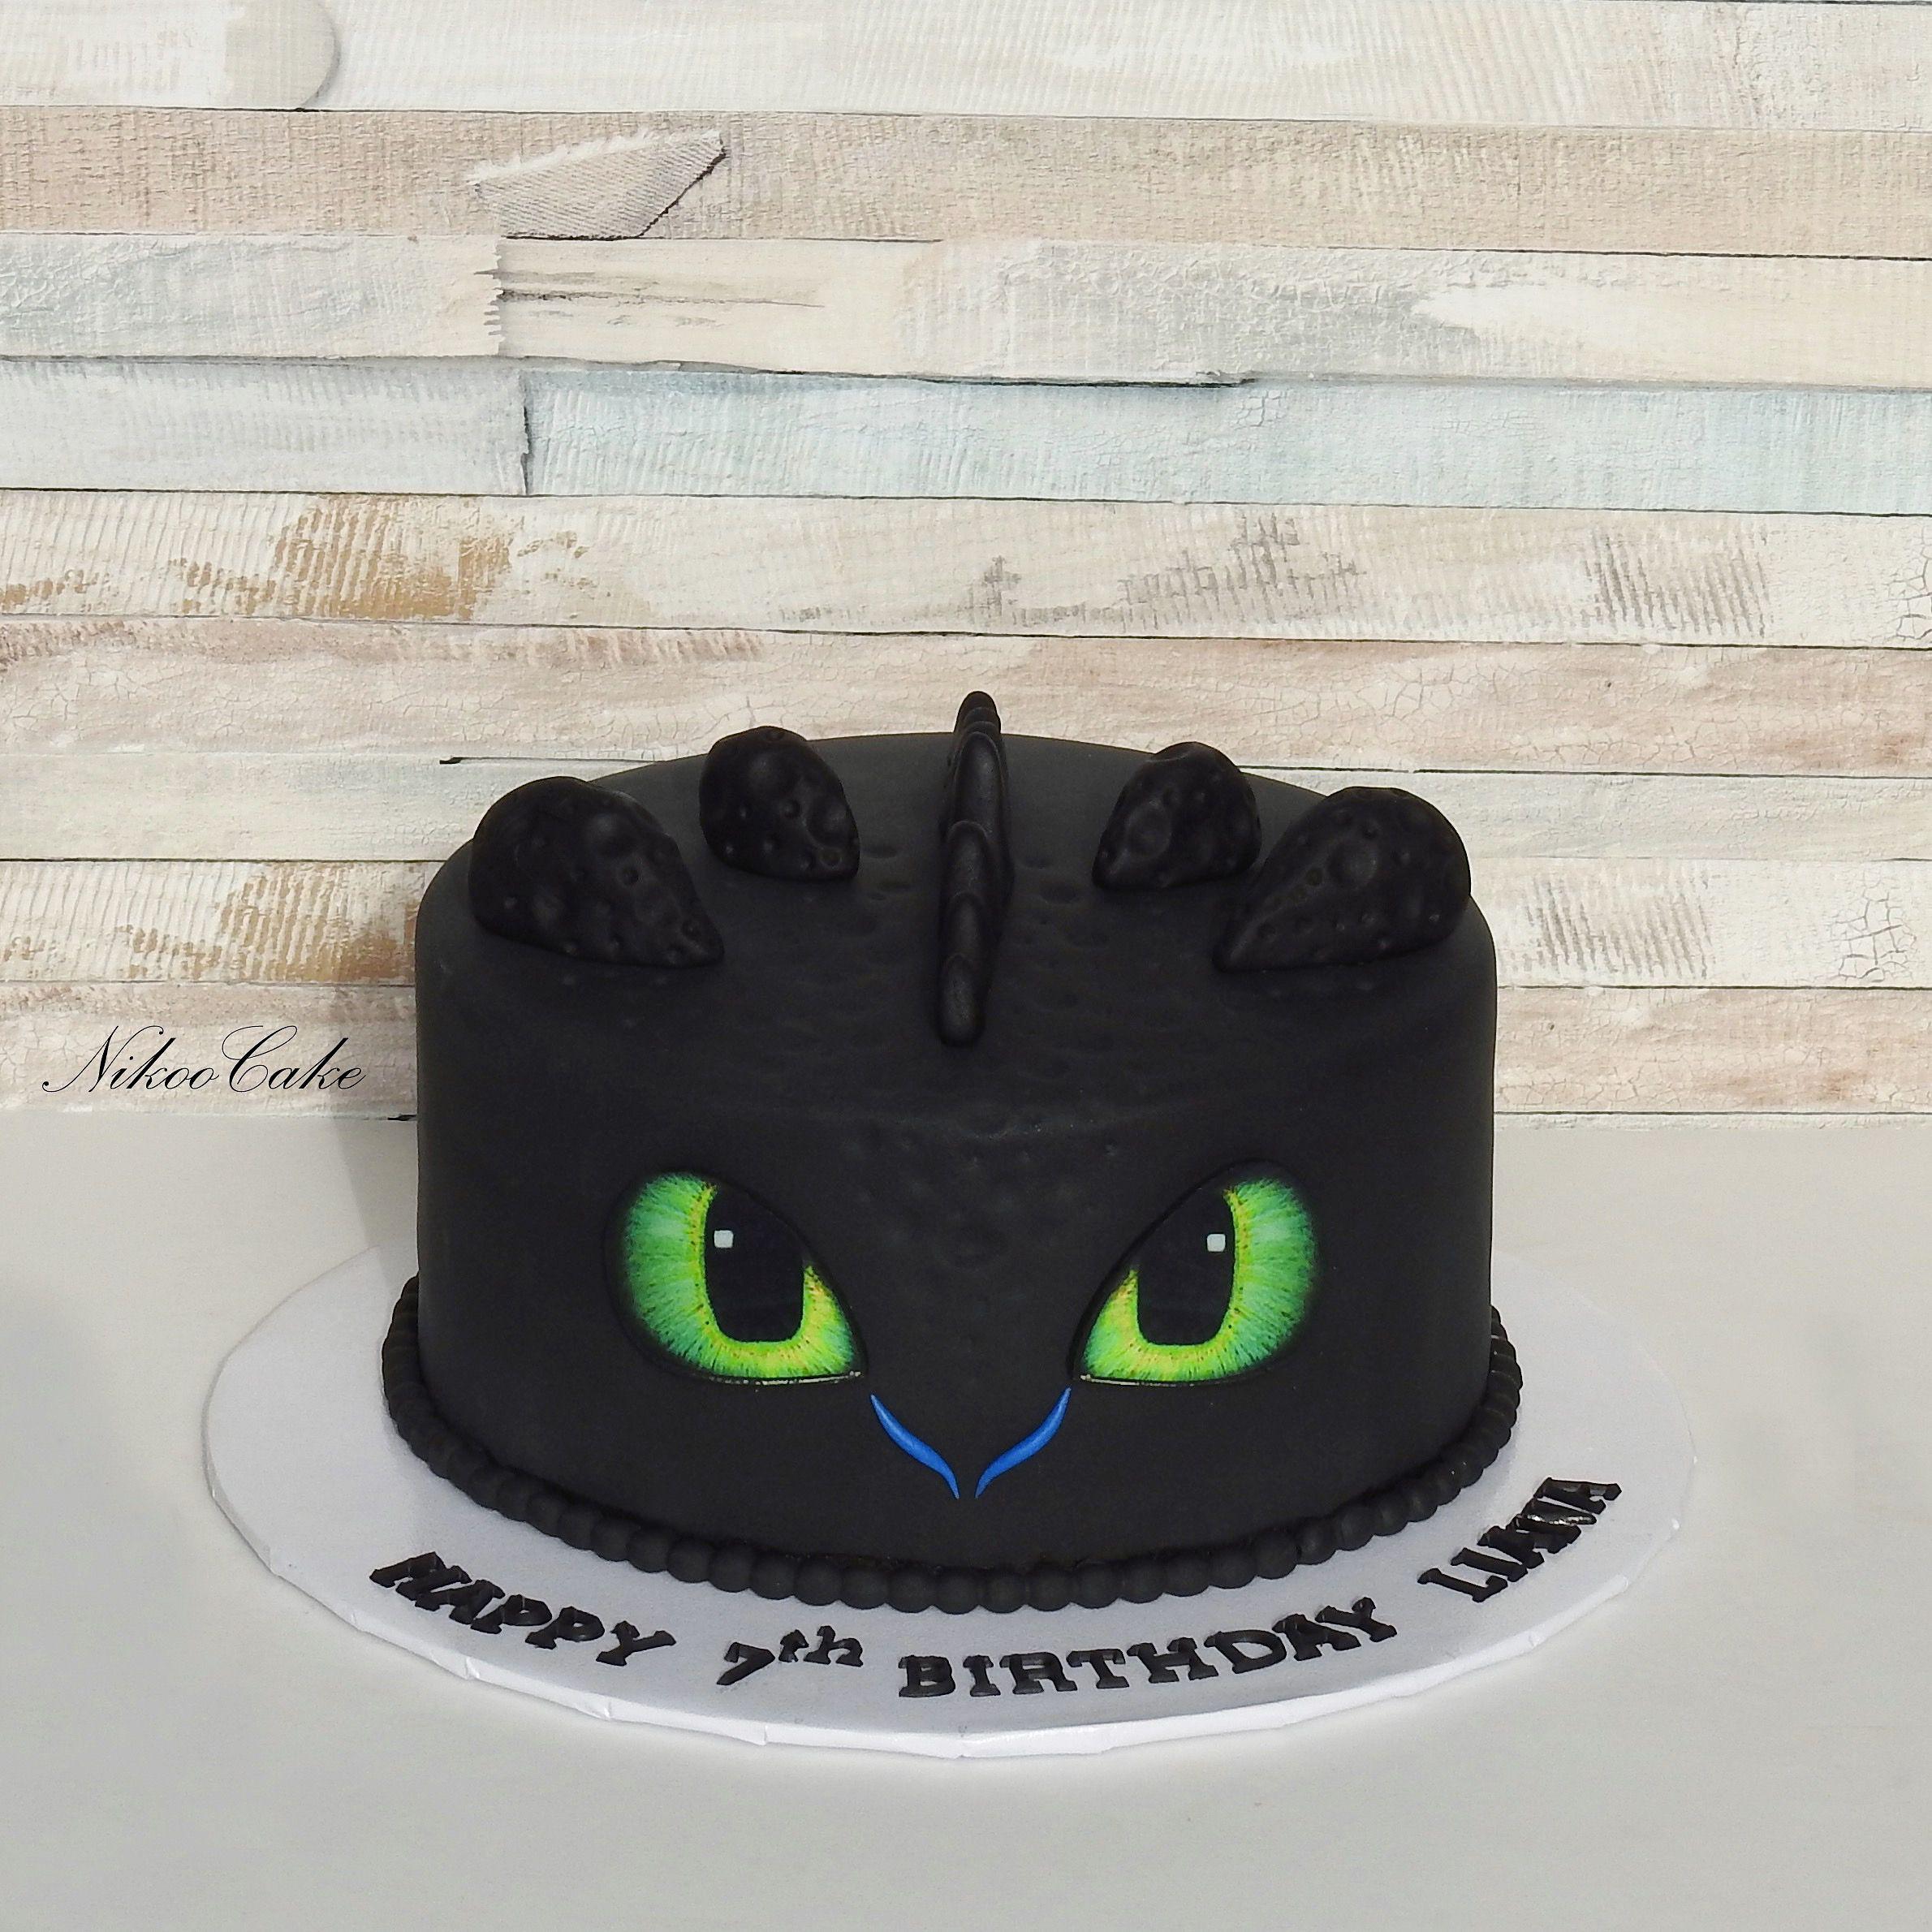 Surprising Toothless Dragon Birthday Cake Personalised Birthday Cards Veneteletsinfo